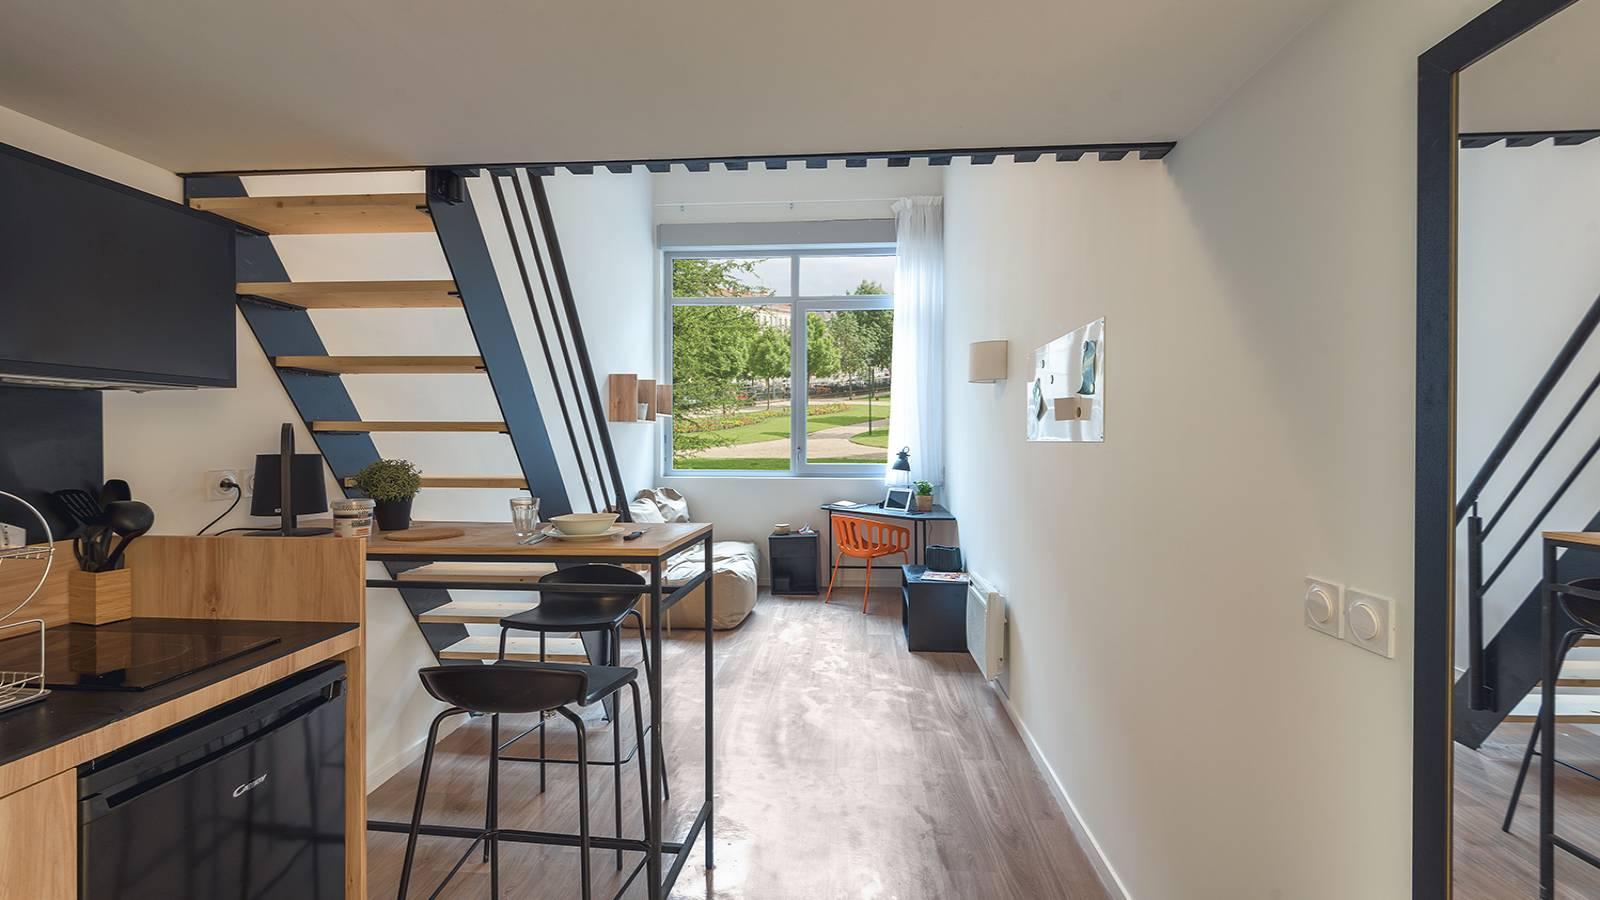 Studio duplex in a residence